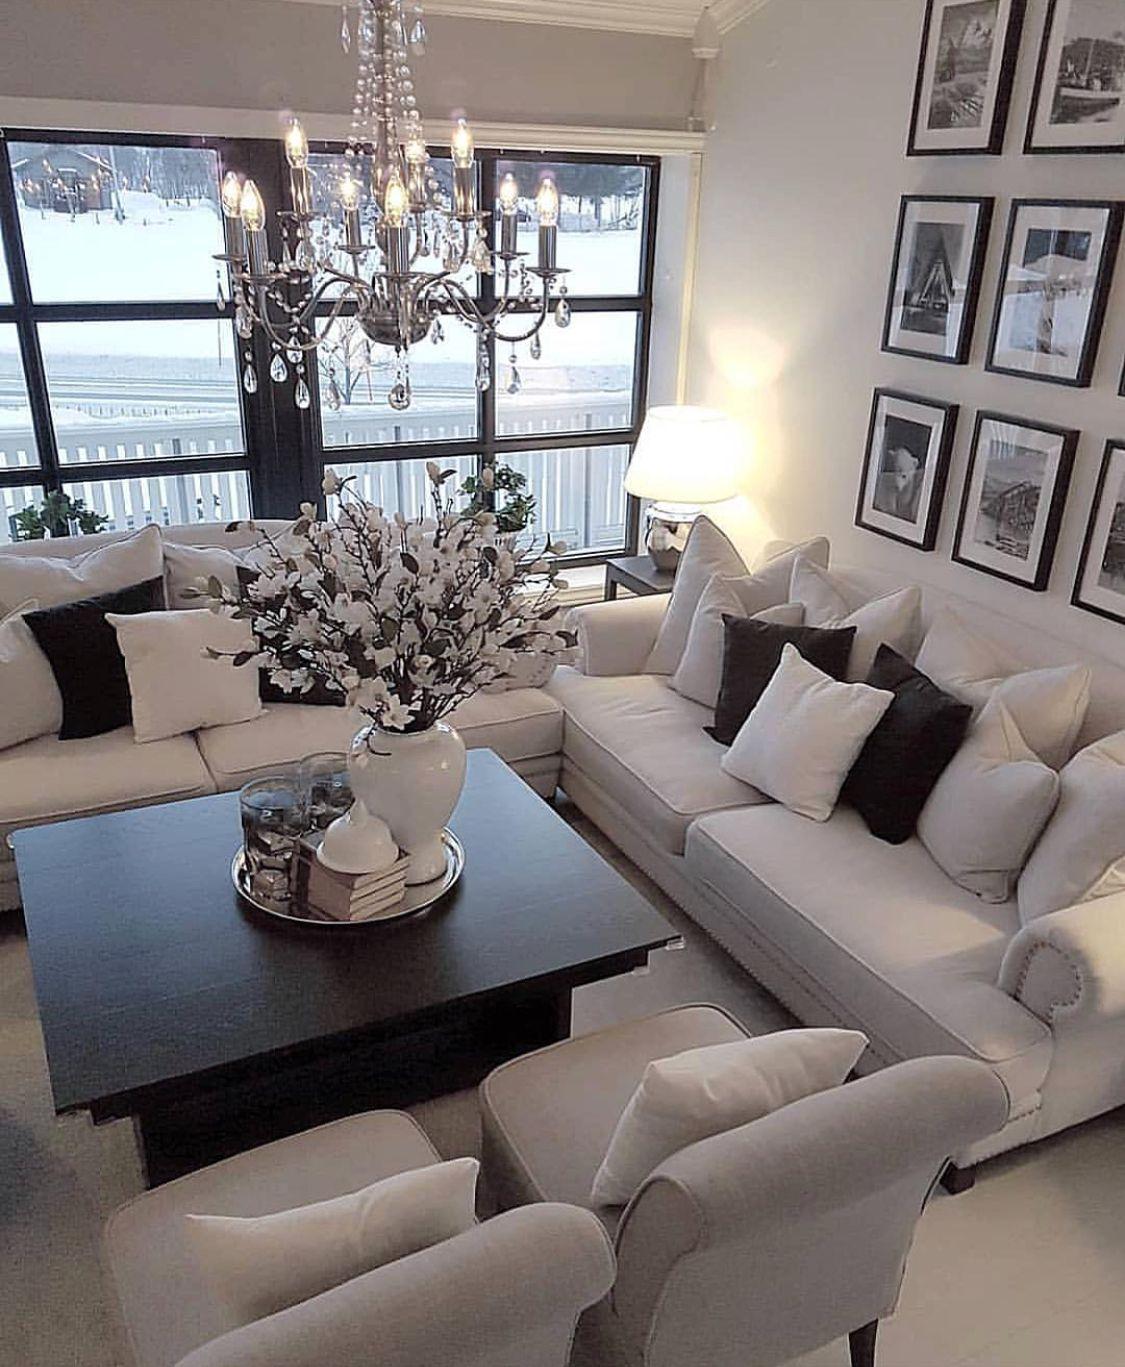 Pin by Sufia Perveen on shahkaar  Small living room decor